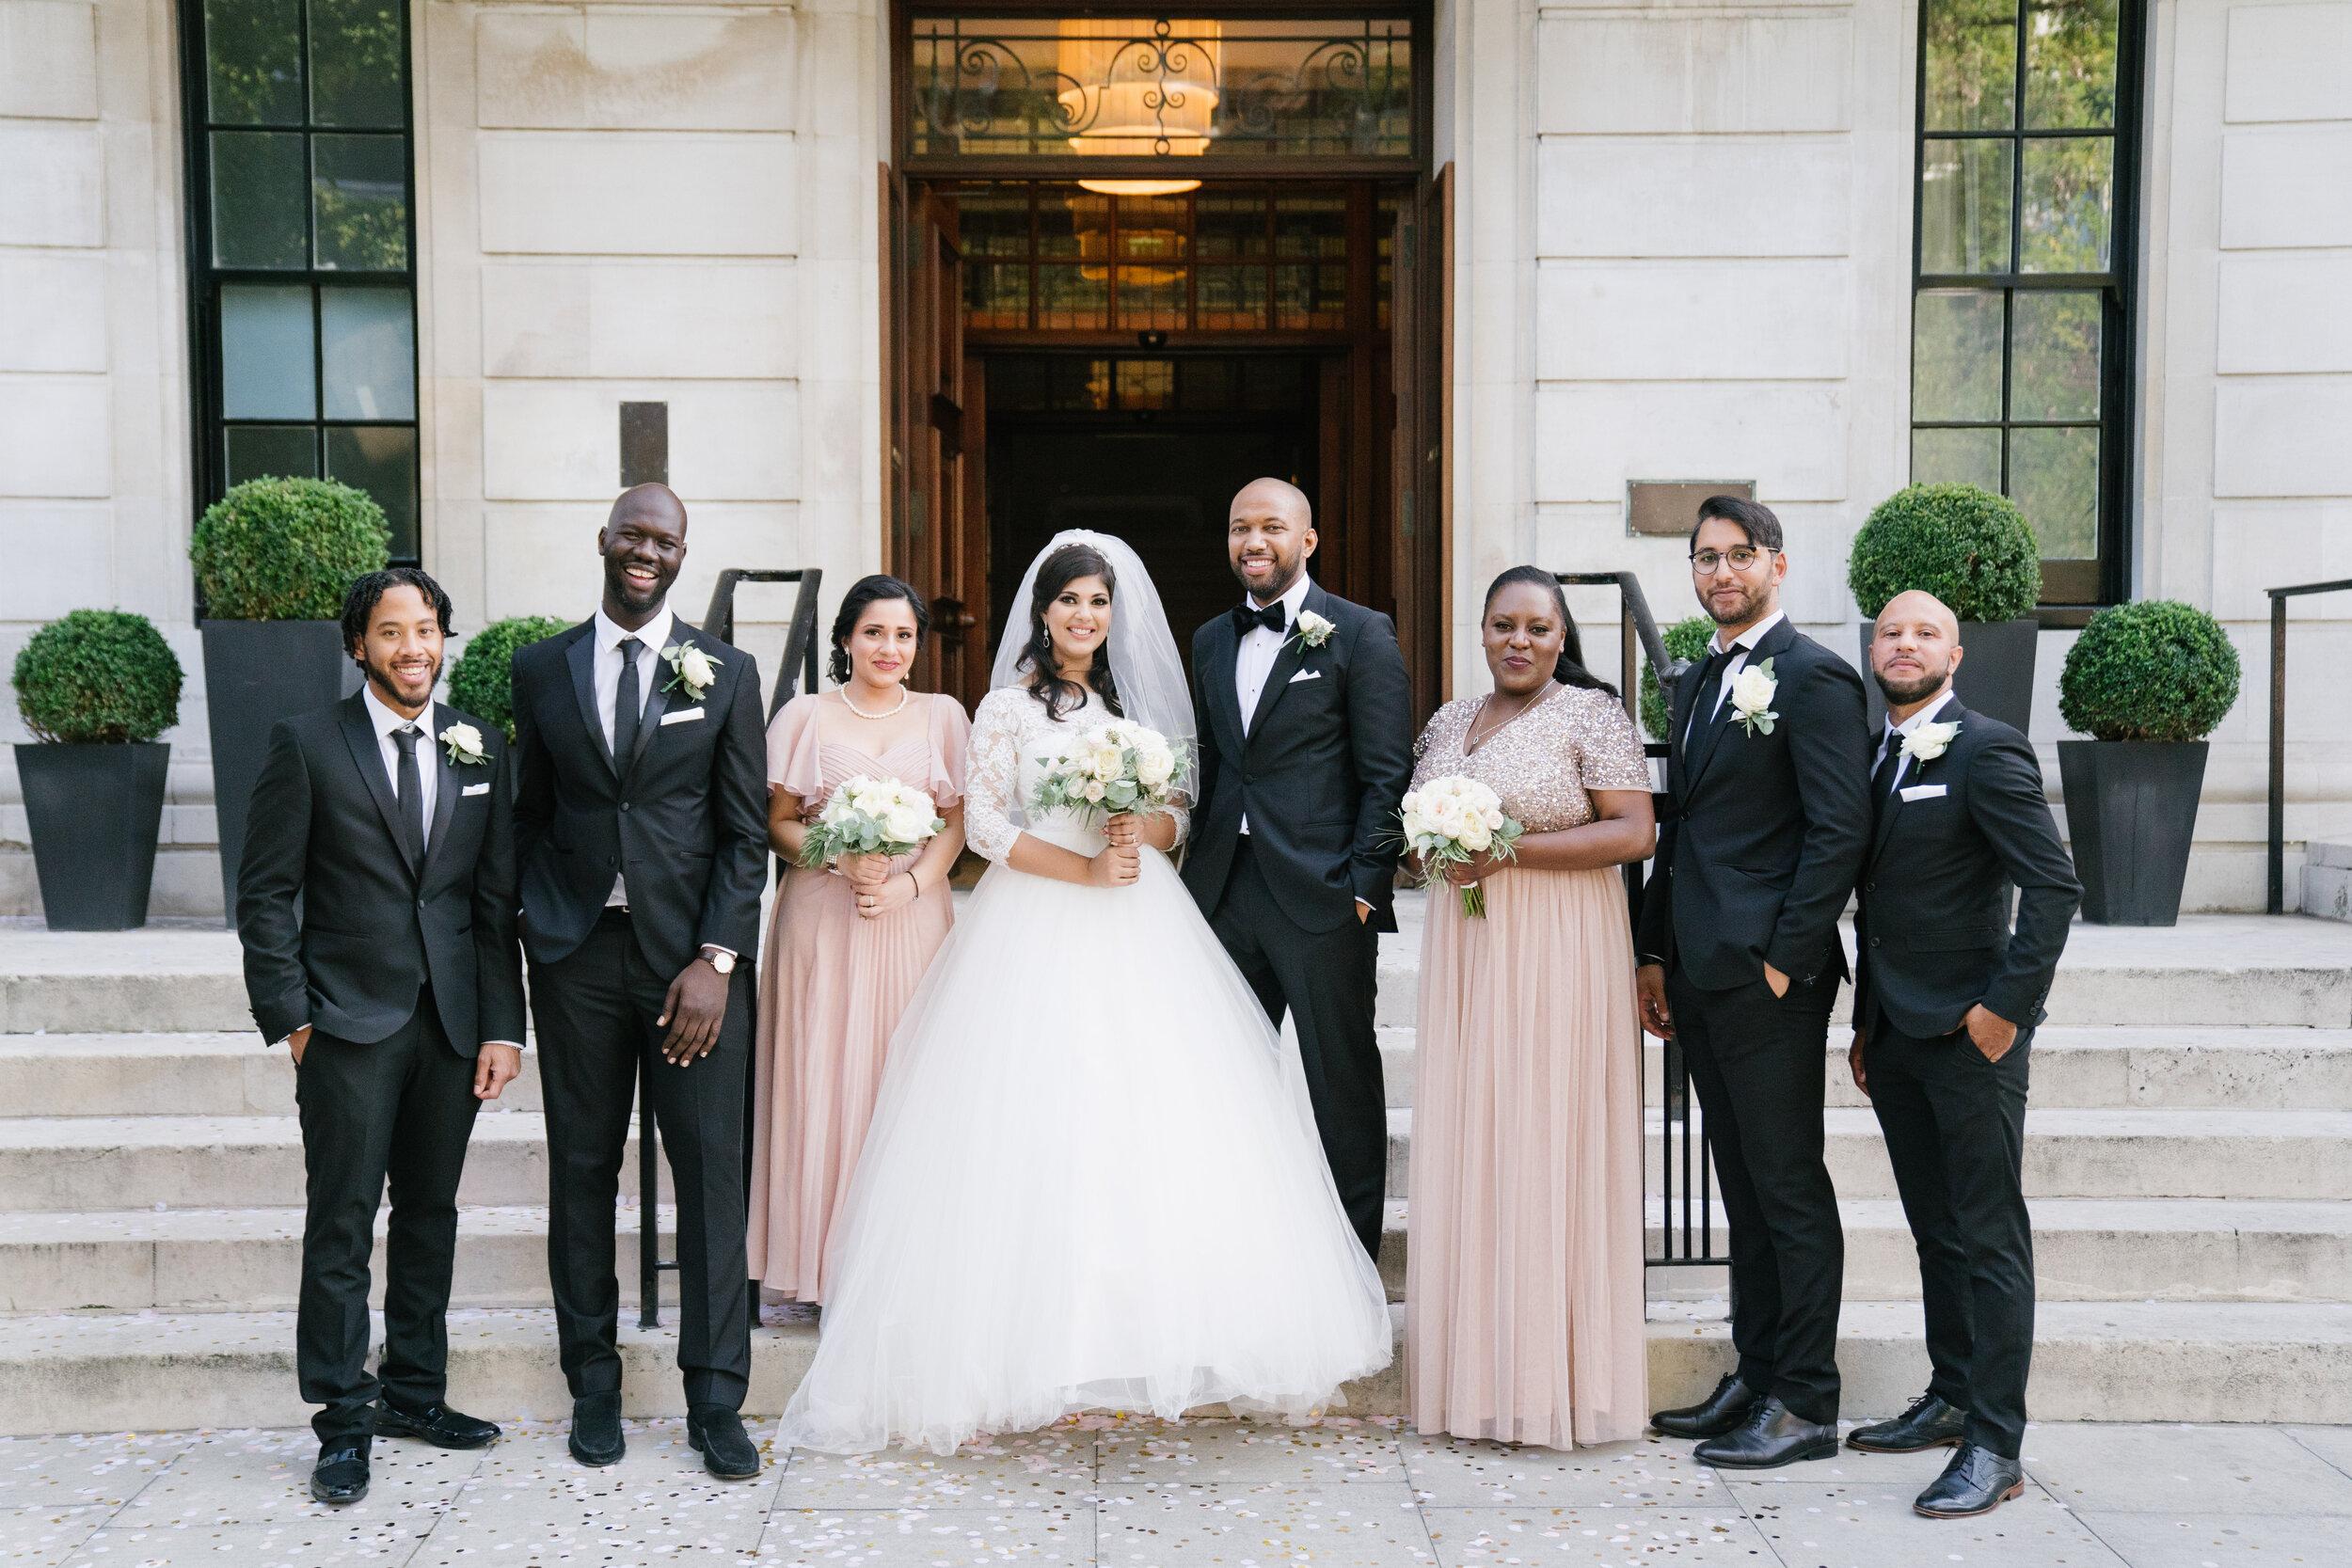 east-london-wedding-photographer-videographer-patriot-square-apartments-60